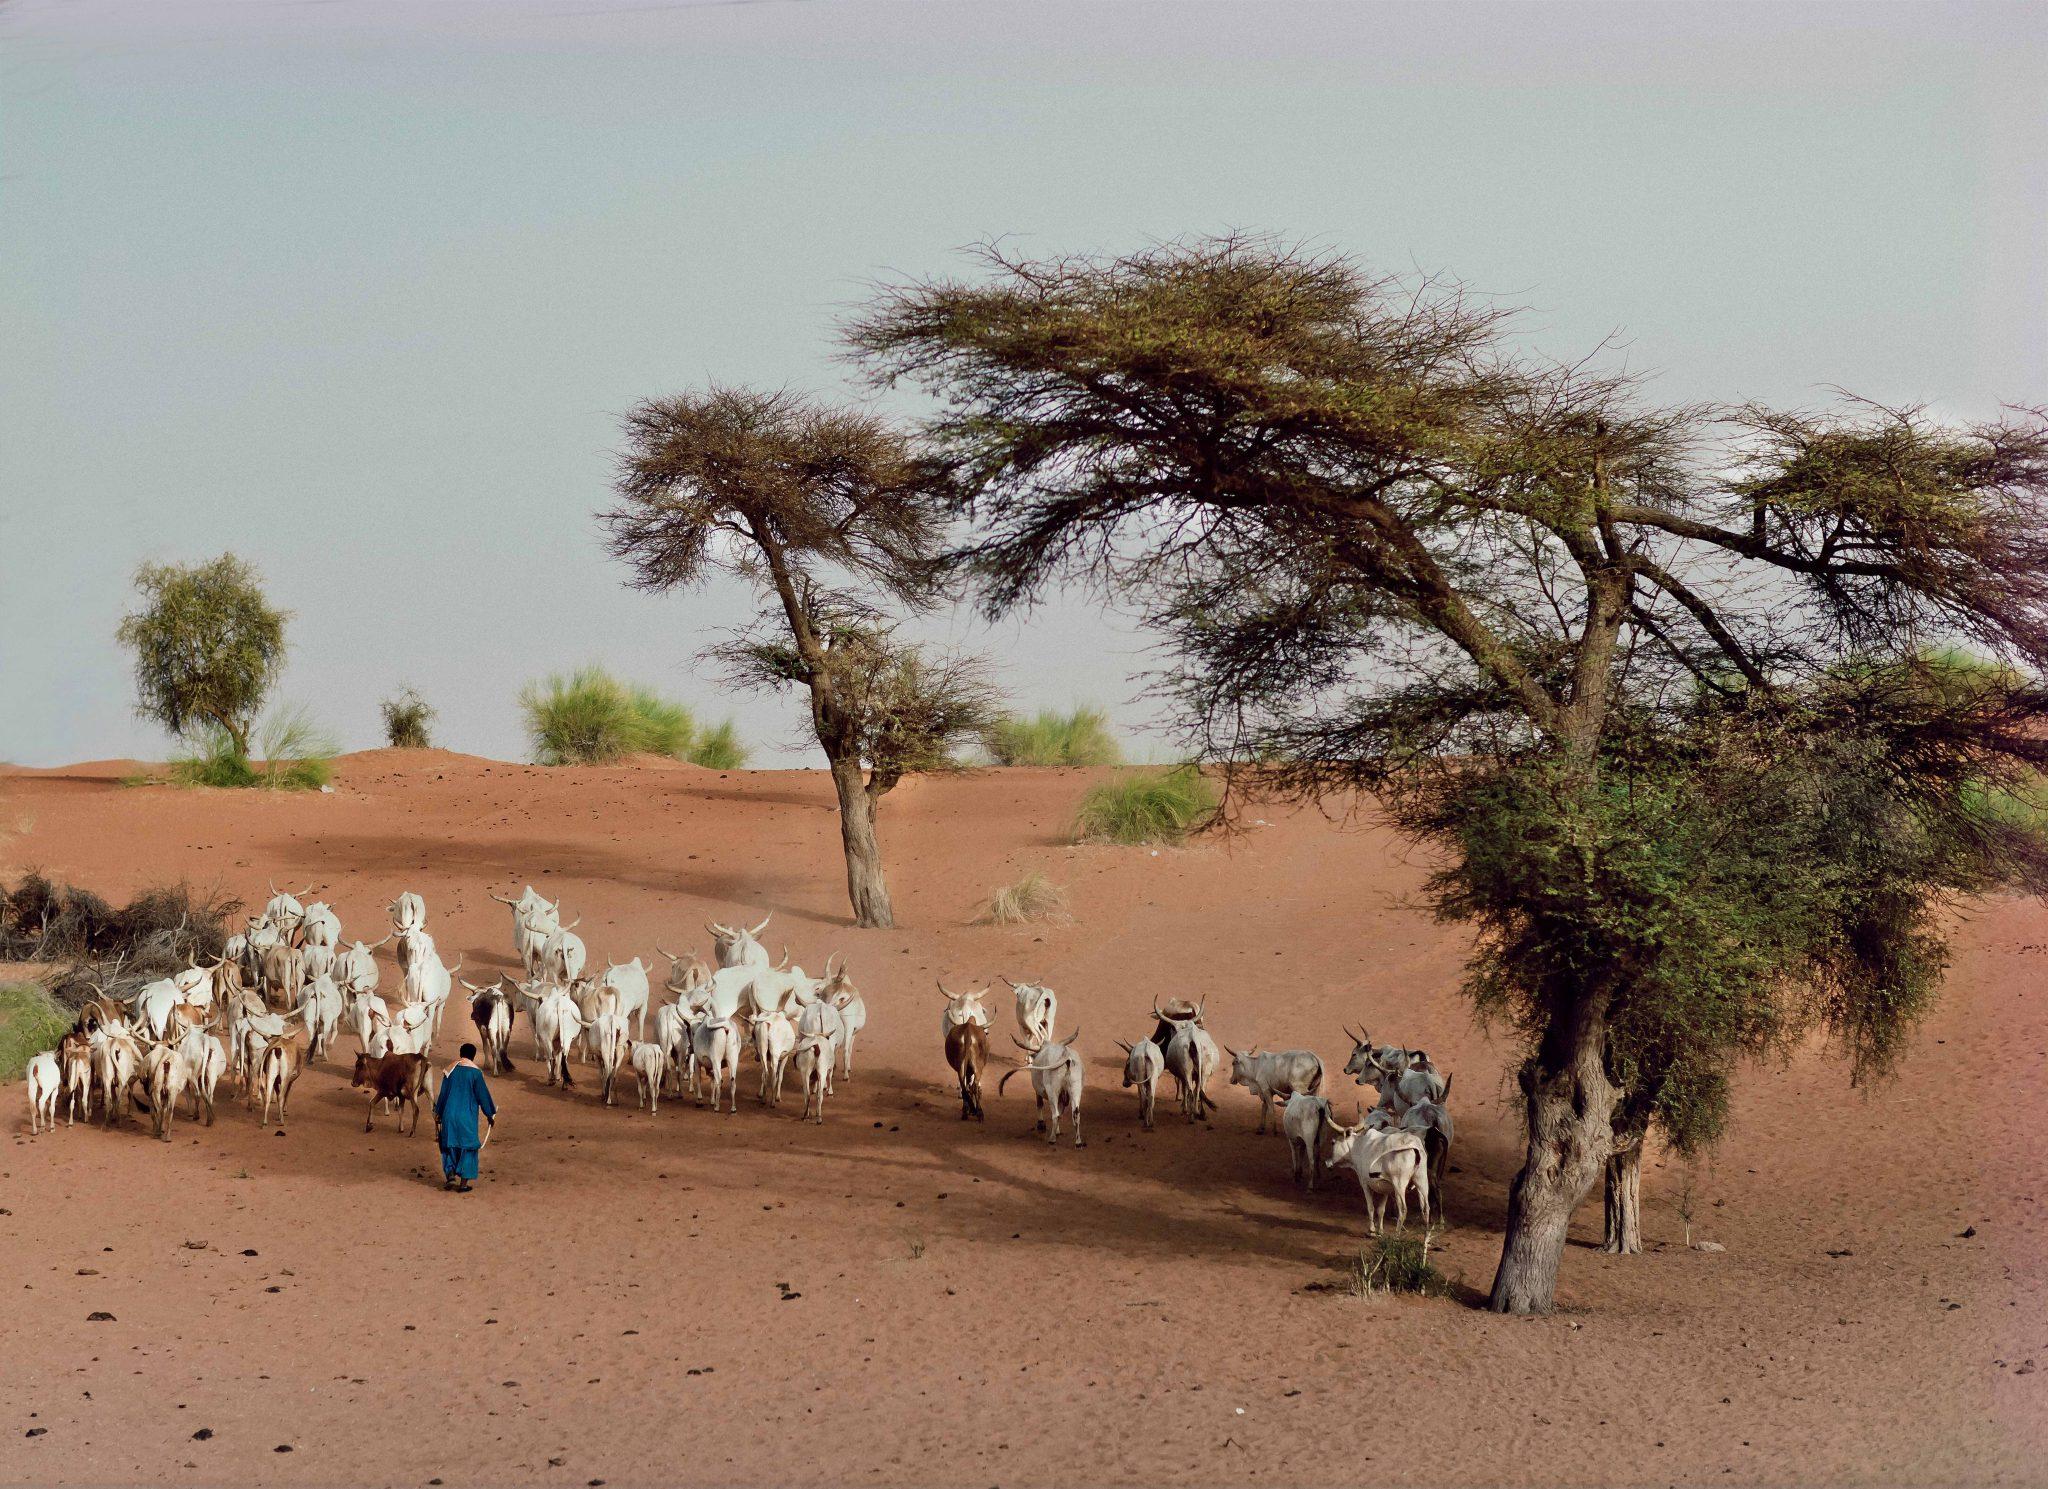 Cattle, Raphael, Senegal